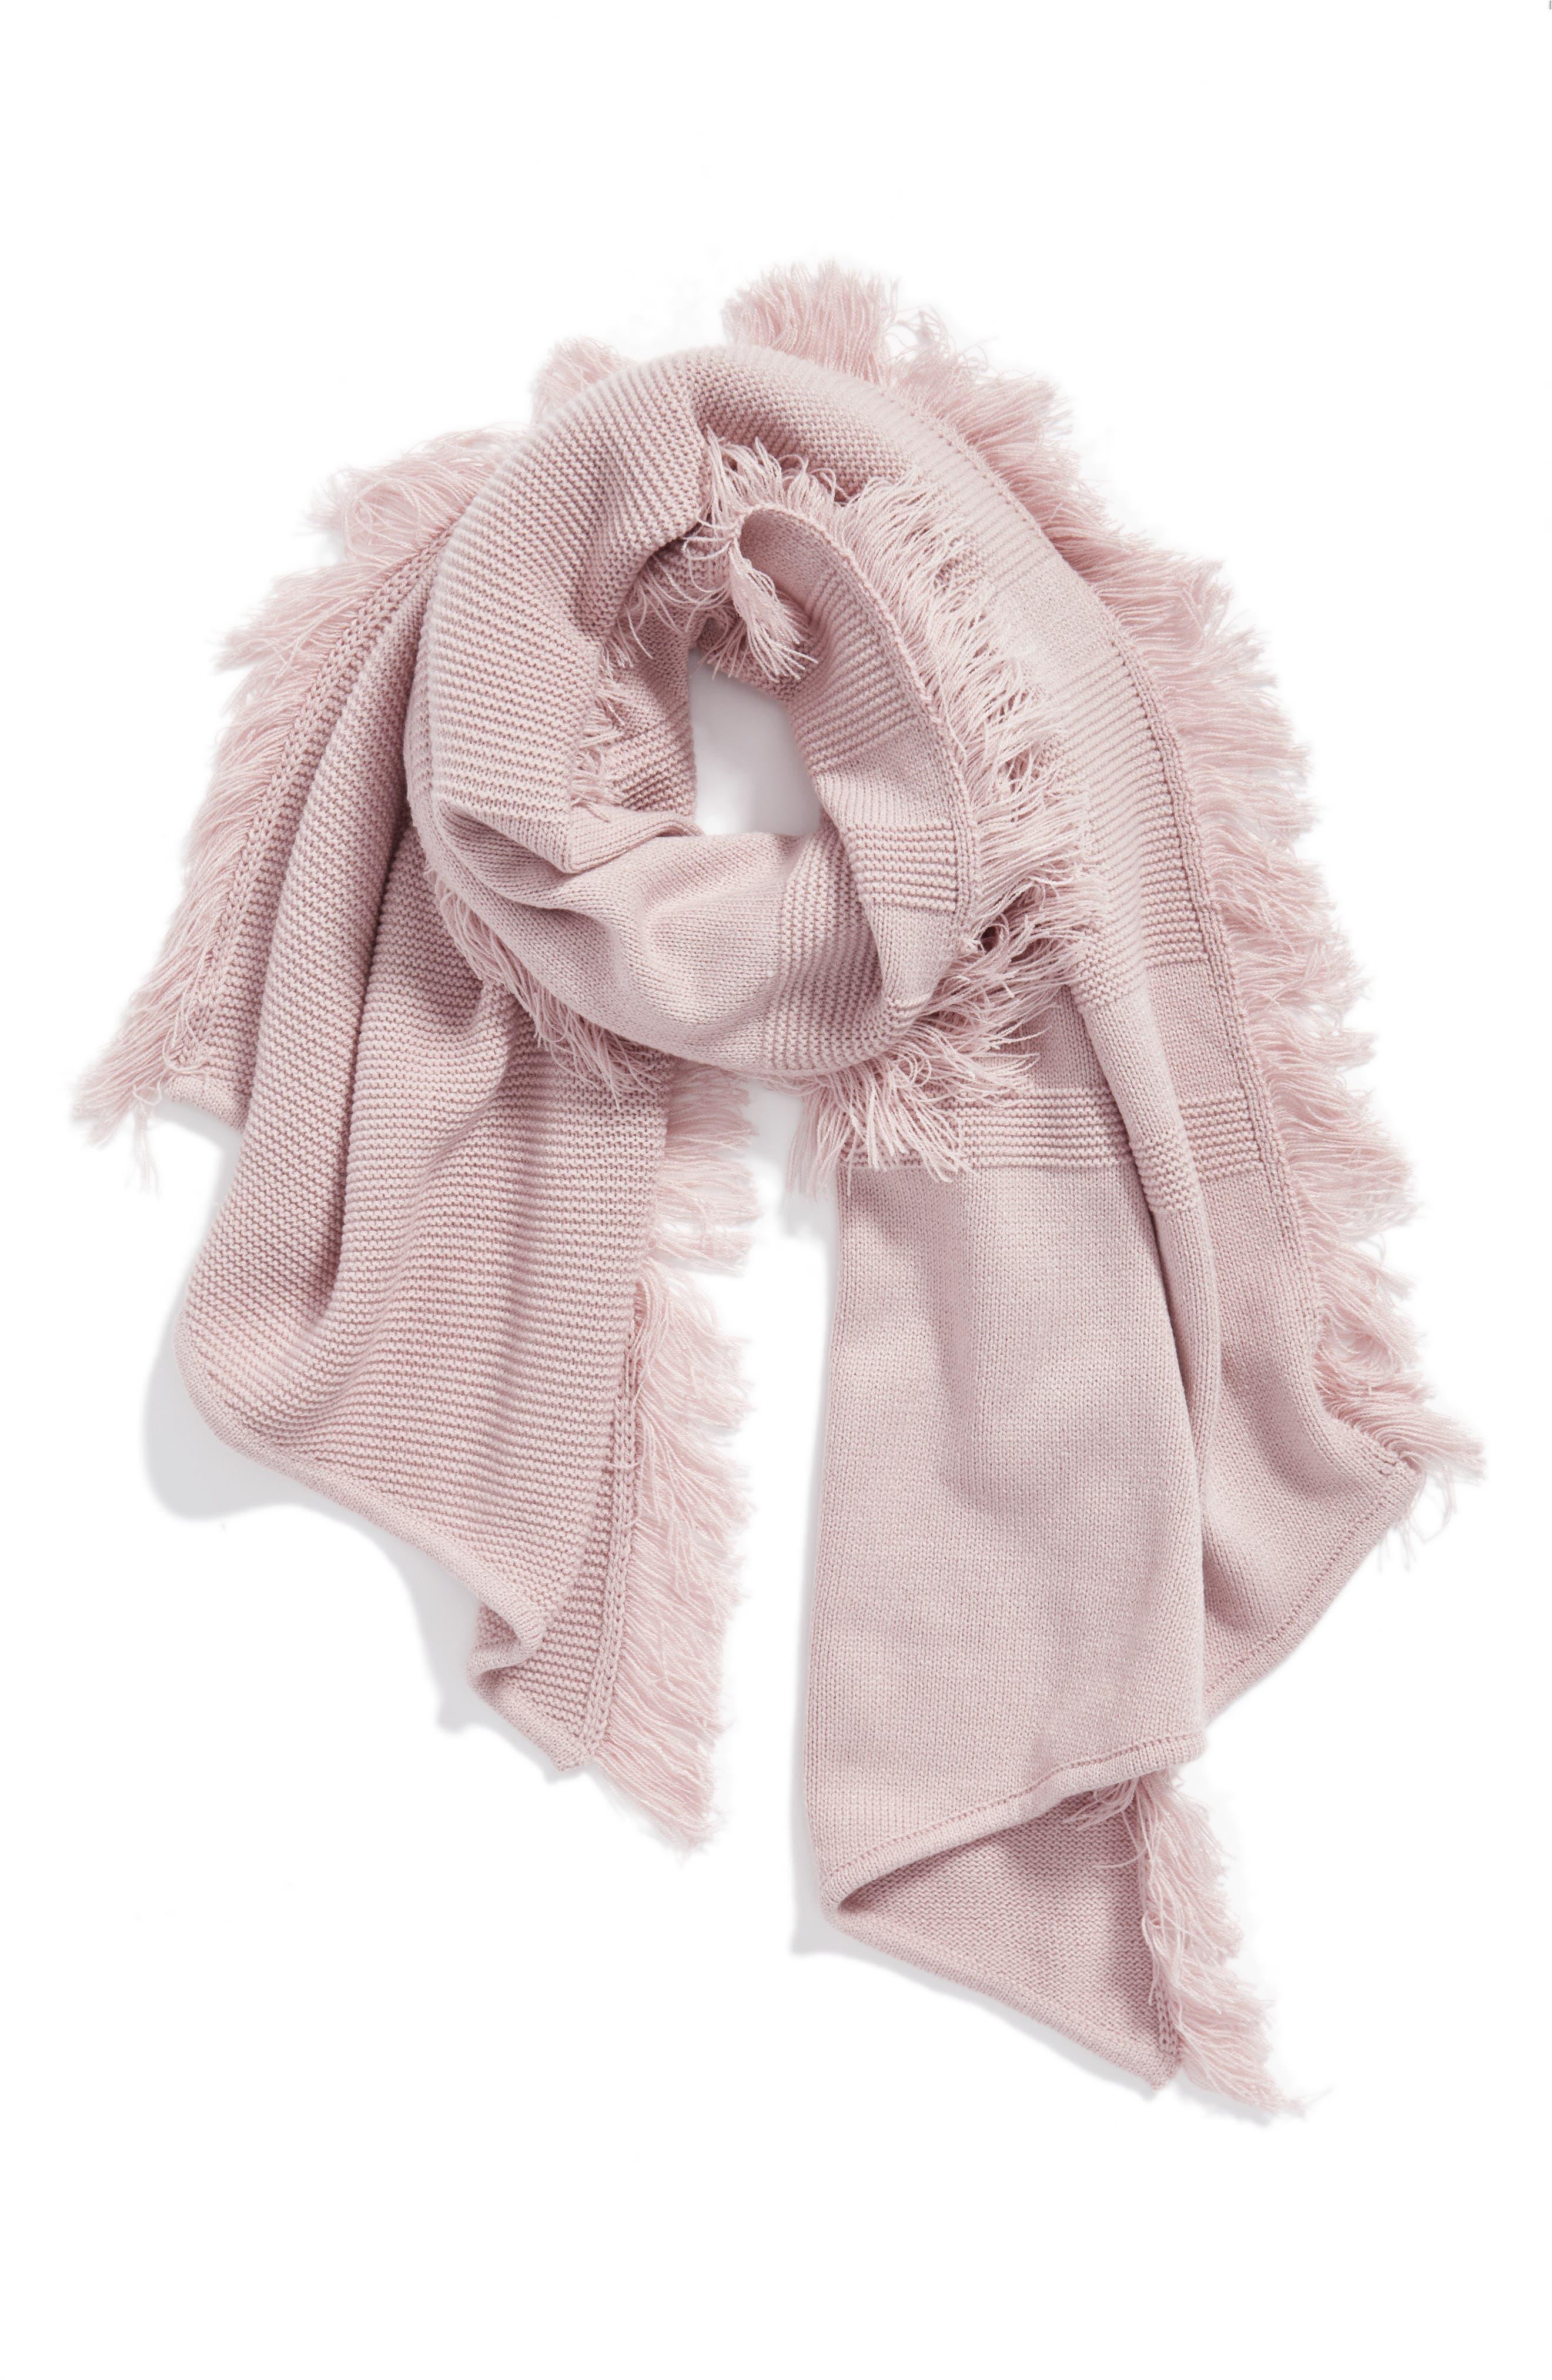 Garter Stripe Stitch Blanket Scarf,                         Main,                         color, Pale Pink